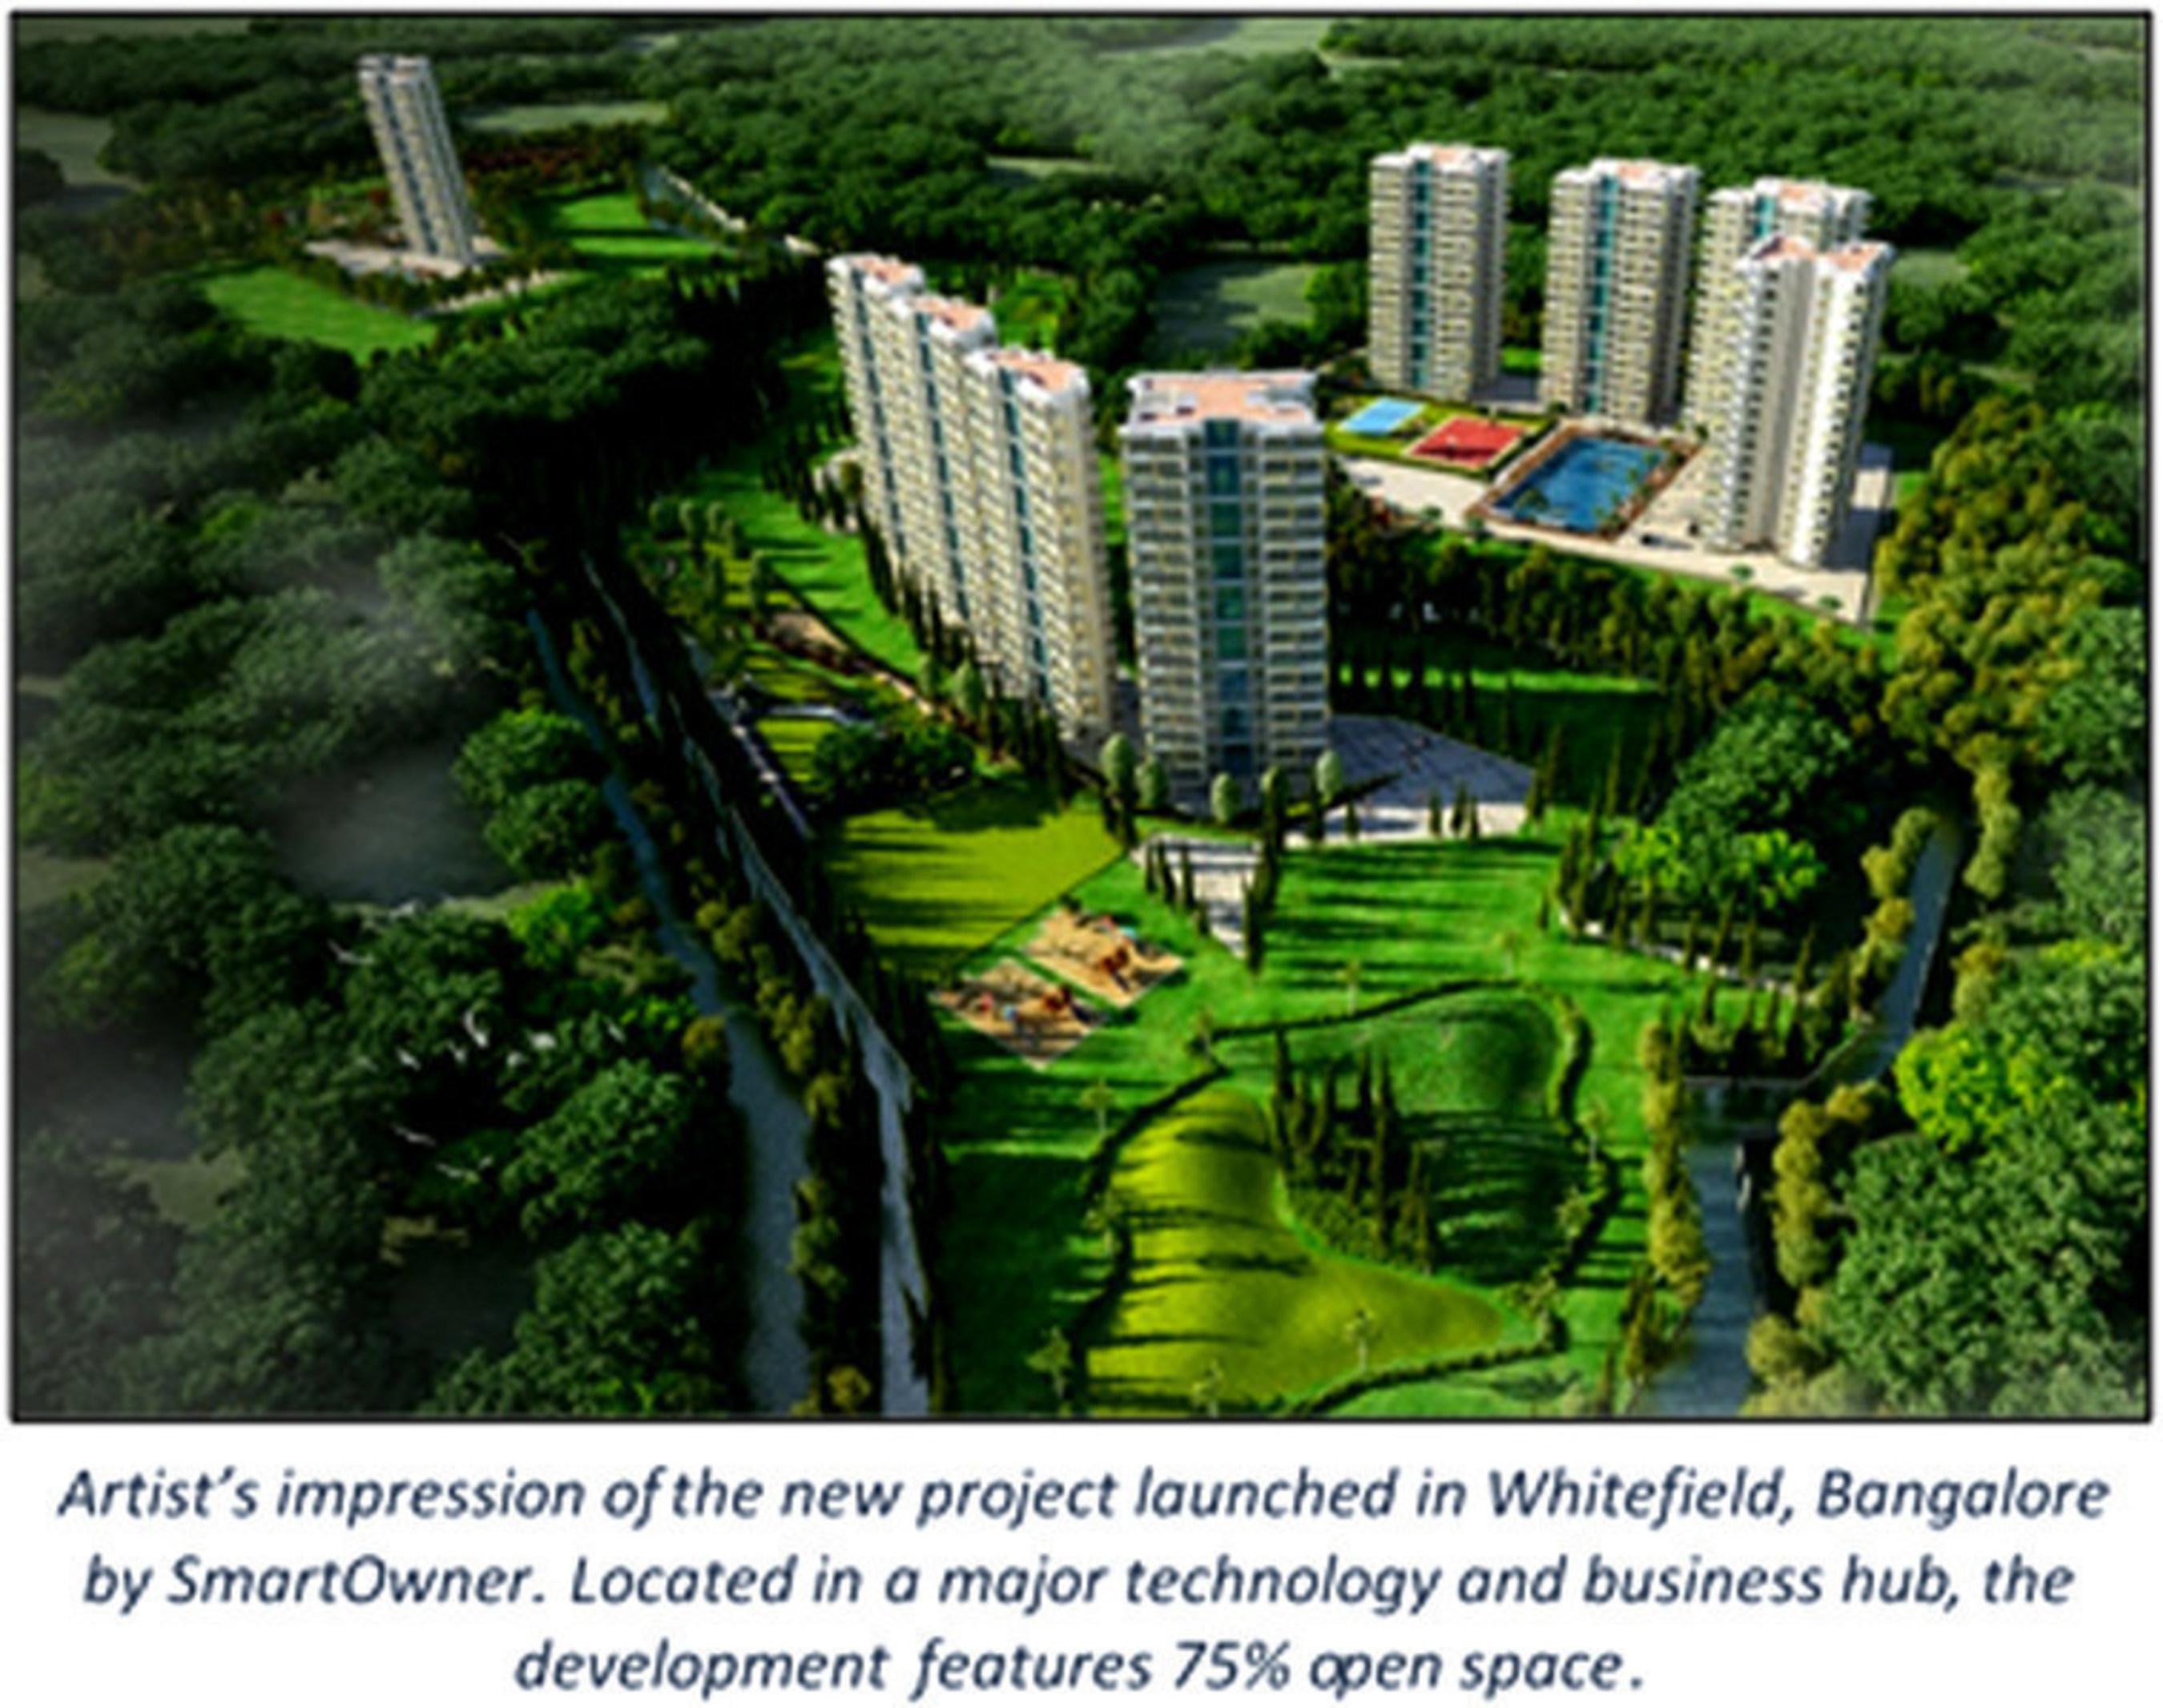 SmartOwner.com Launches Premium Project for Real Estate investors